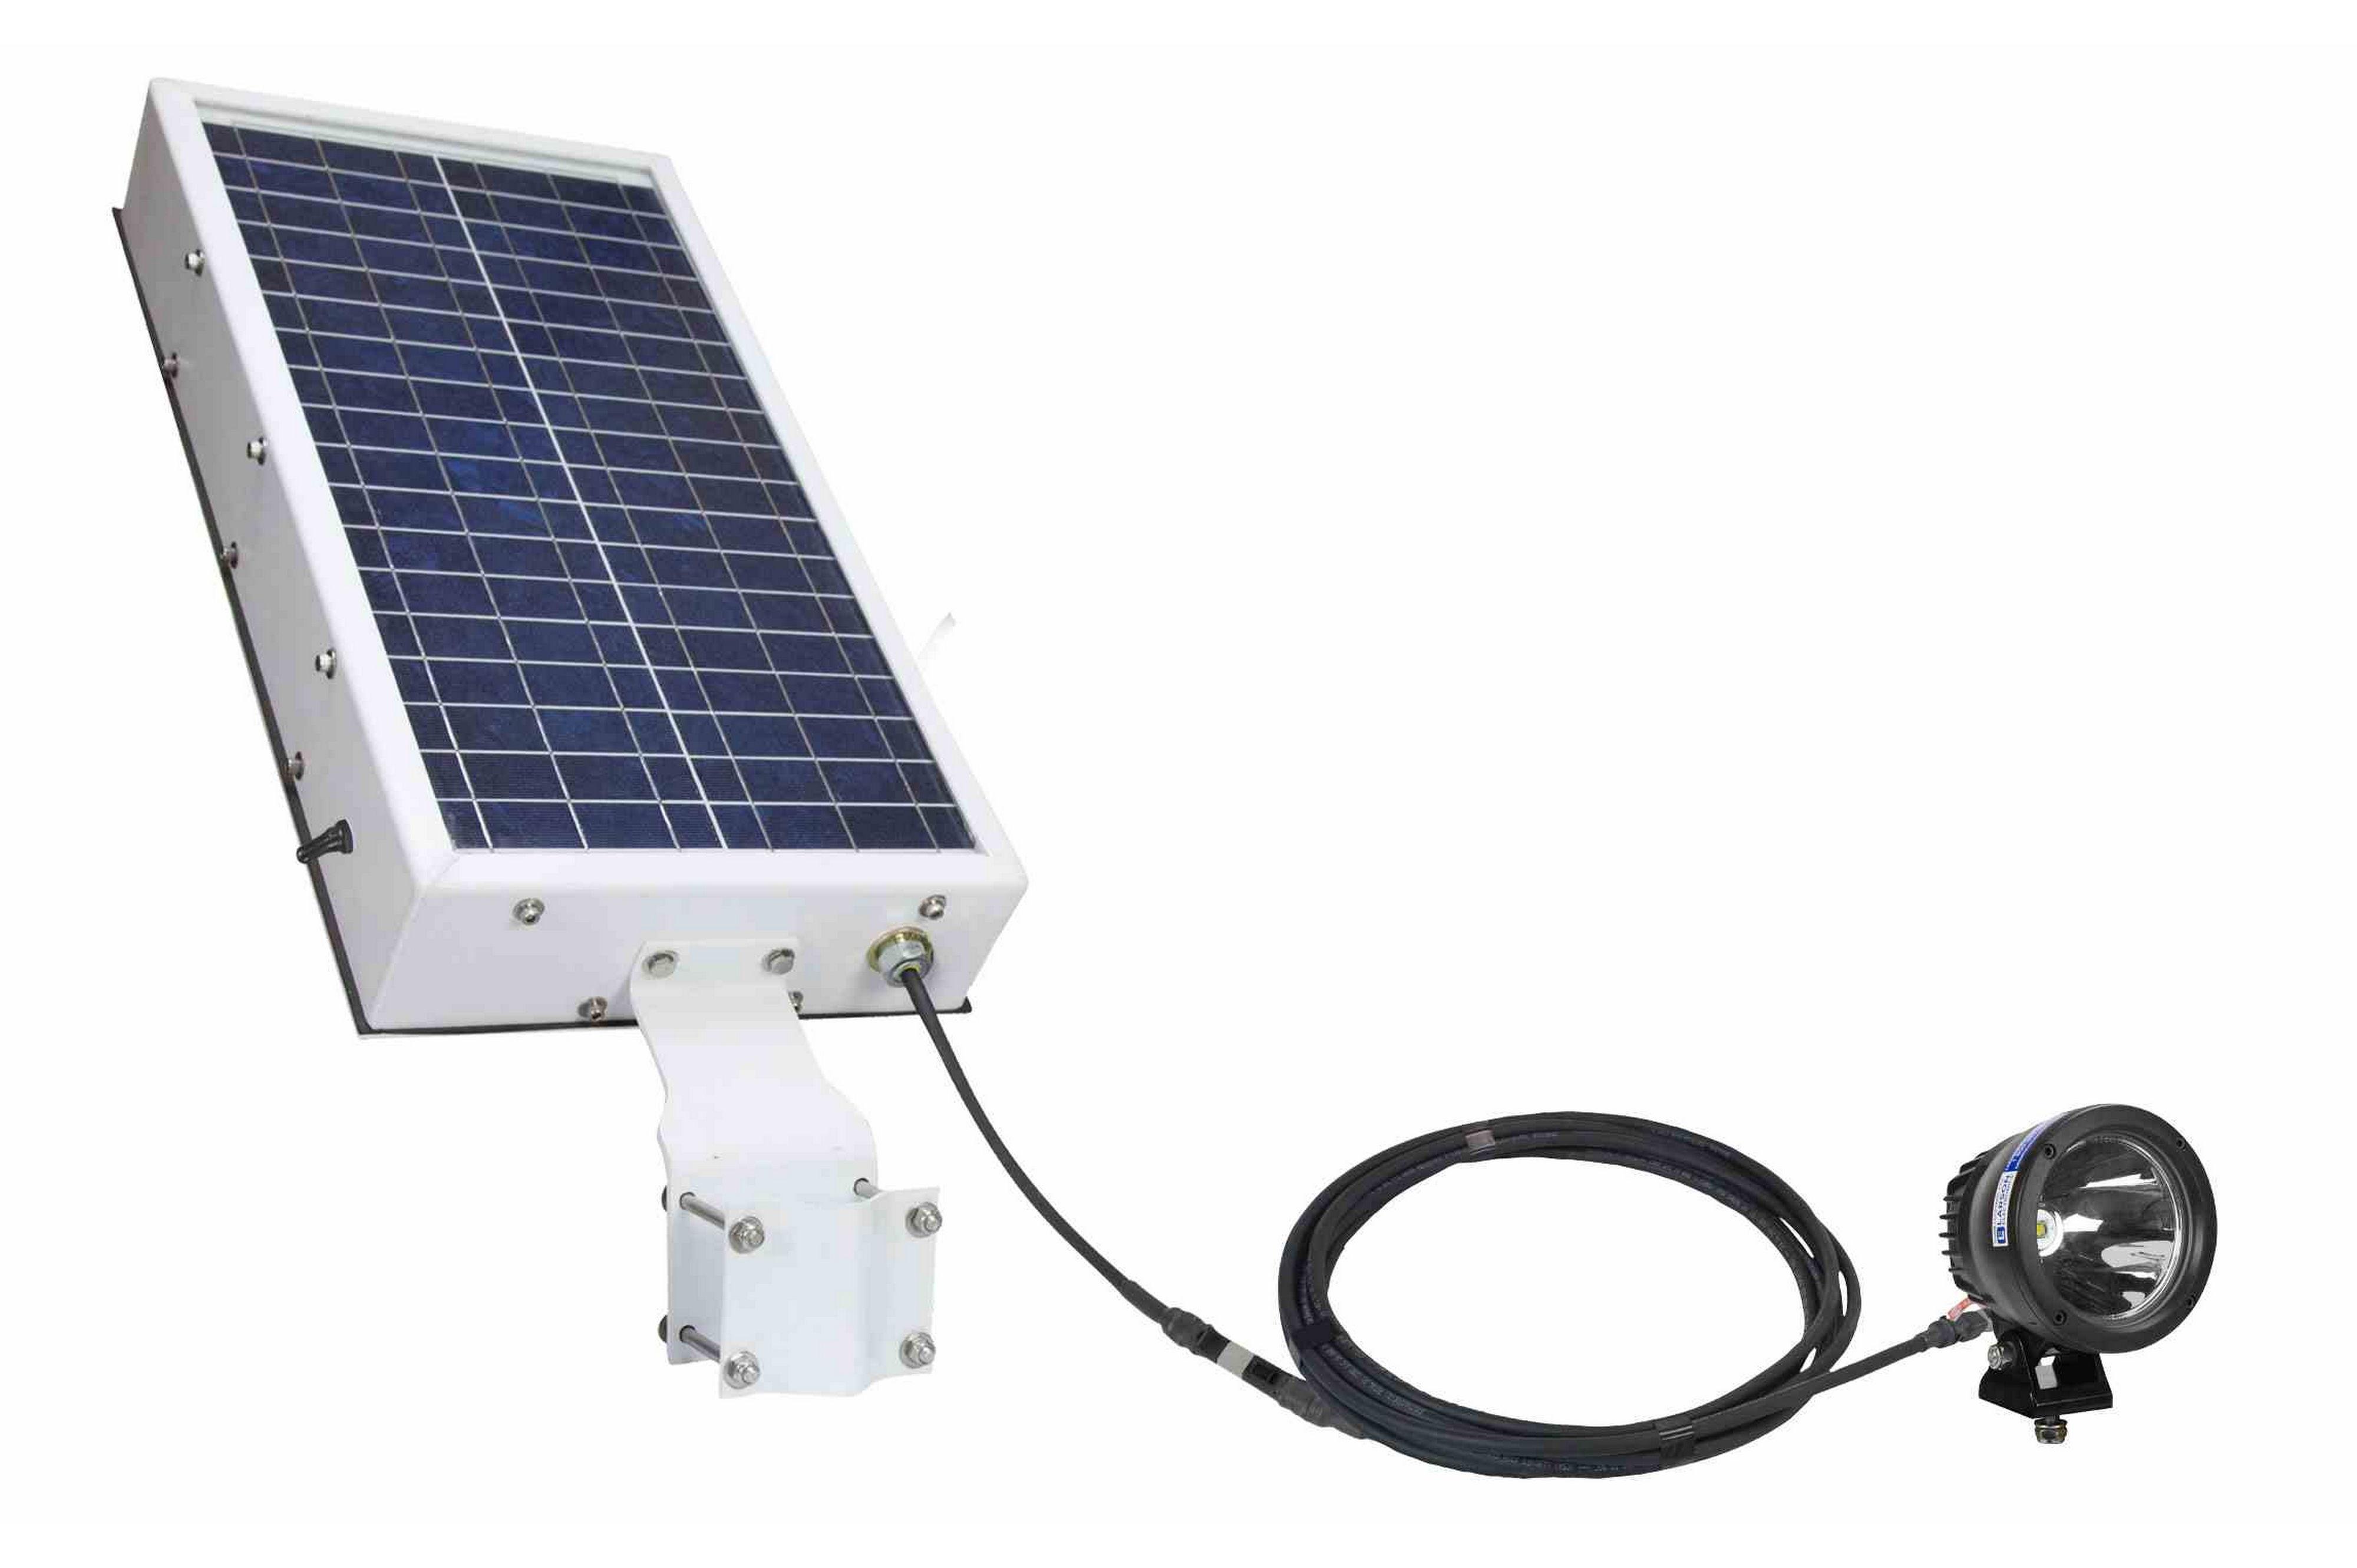 25w Solar Powered Led Light 2750 Lumens 15 Hour Run